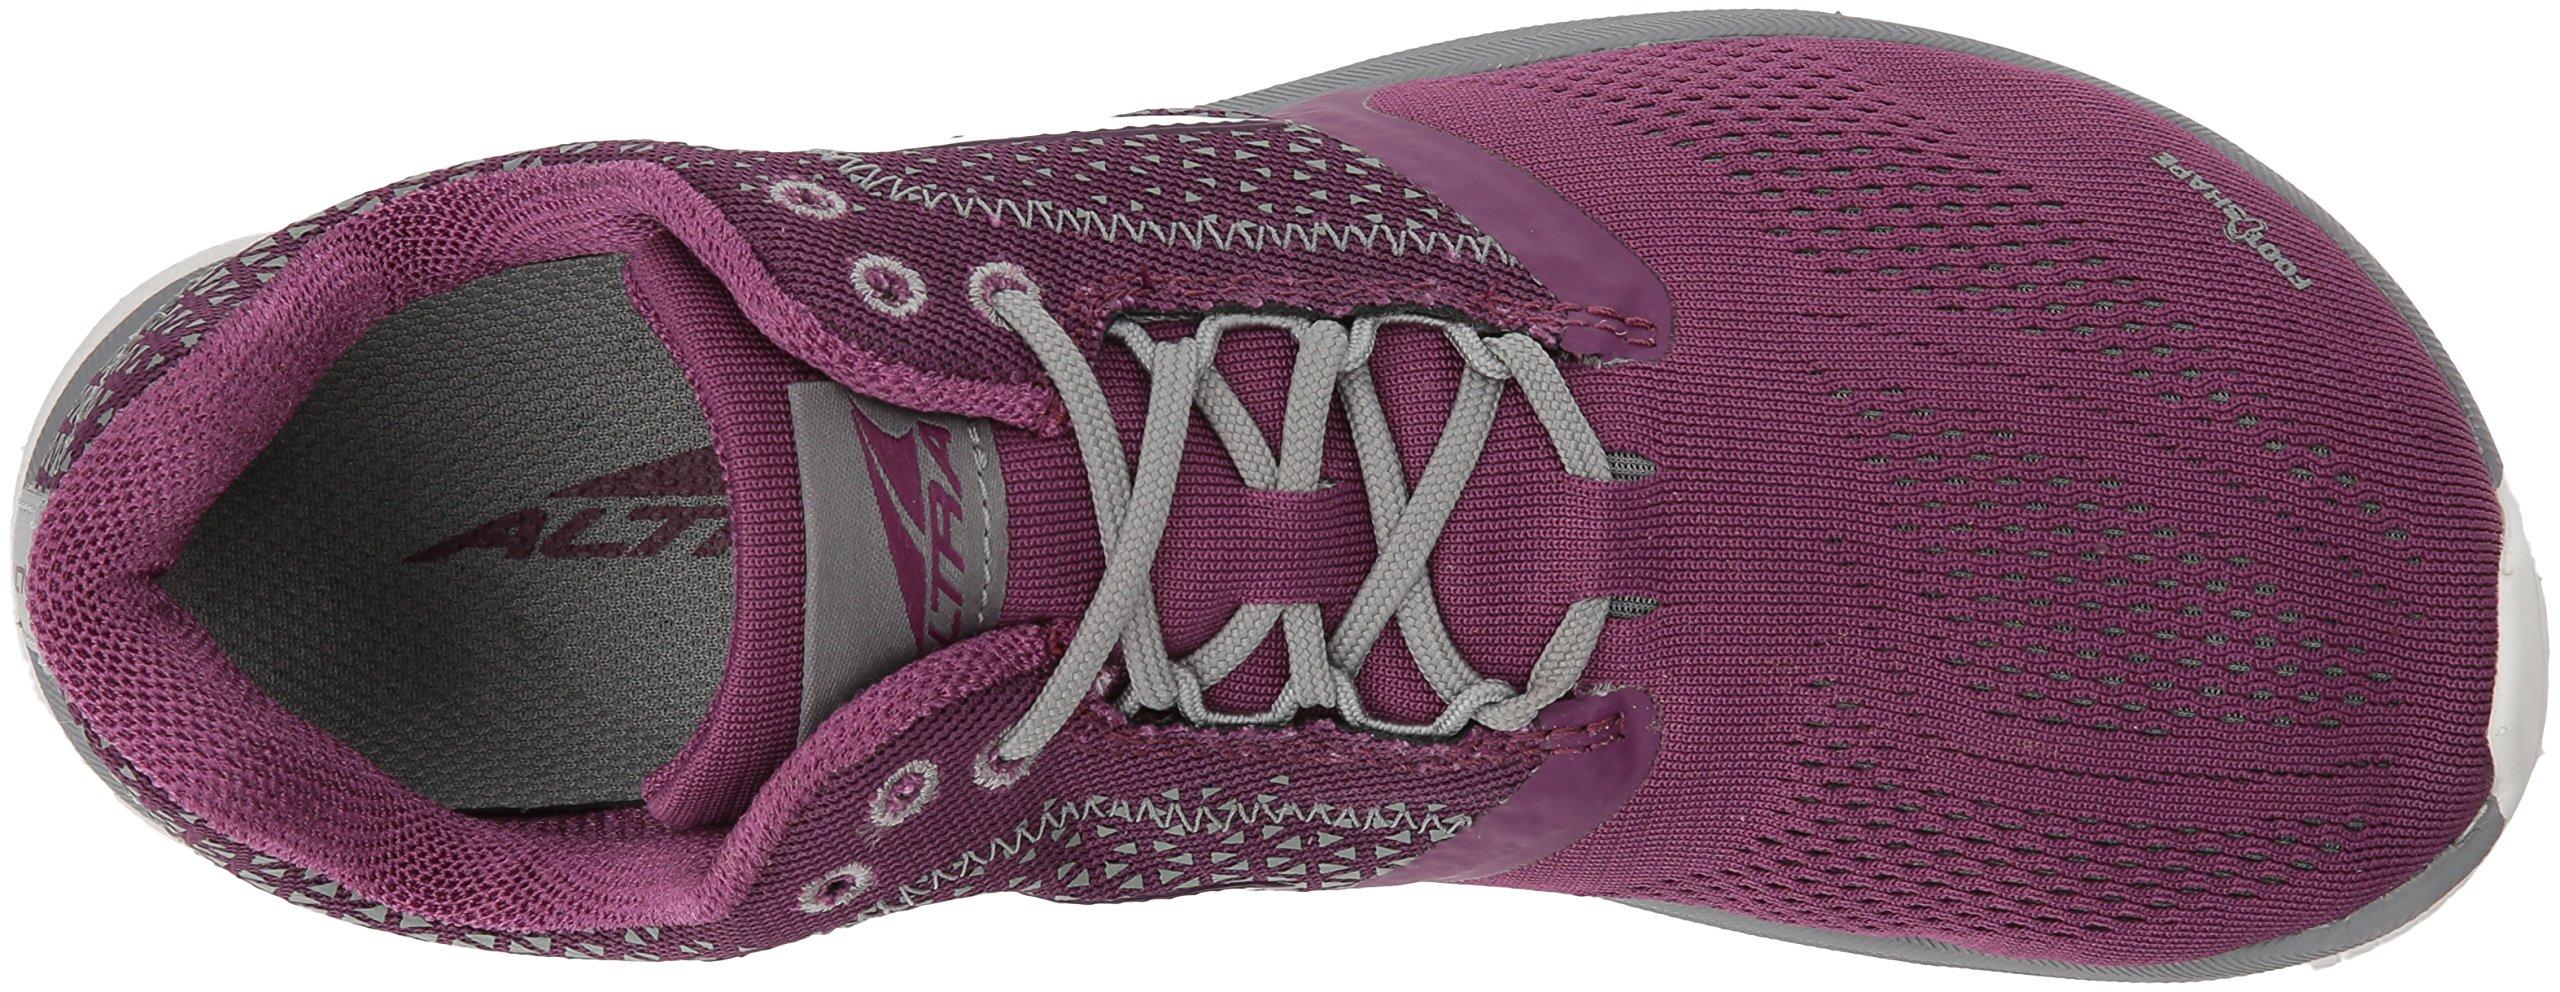 Altra Women's Solstice Sneaker, Purple, 5.5 Regular US by Altra (Image #7)